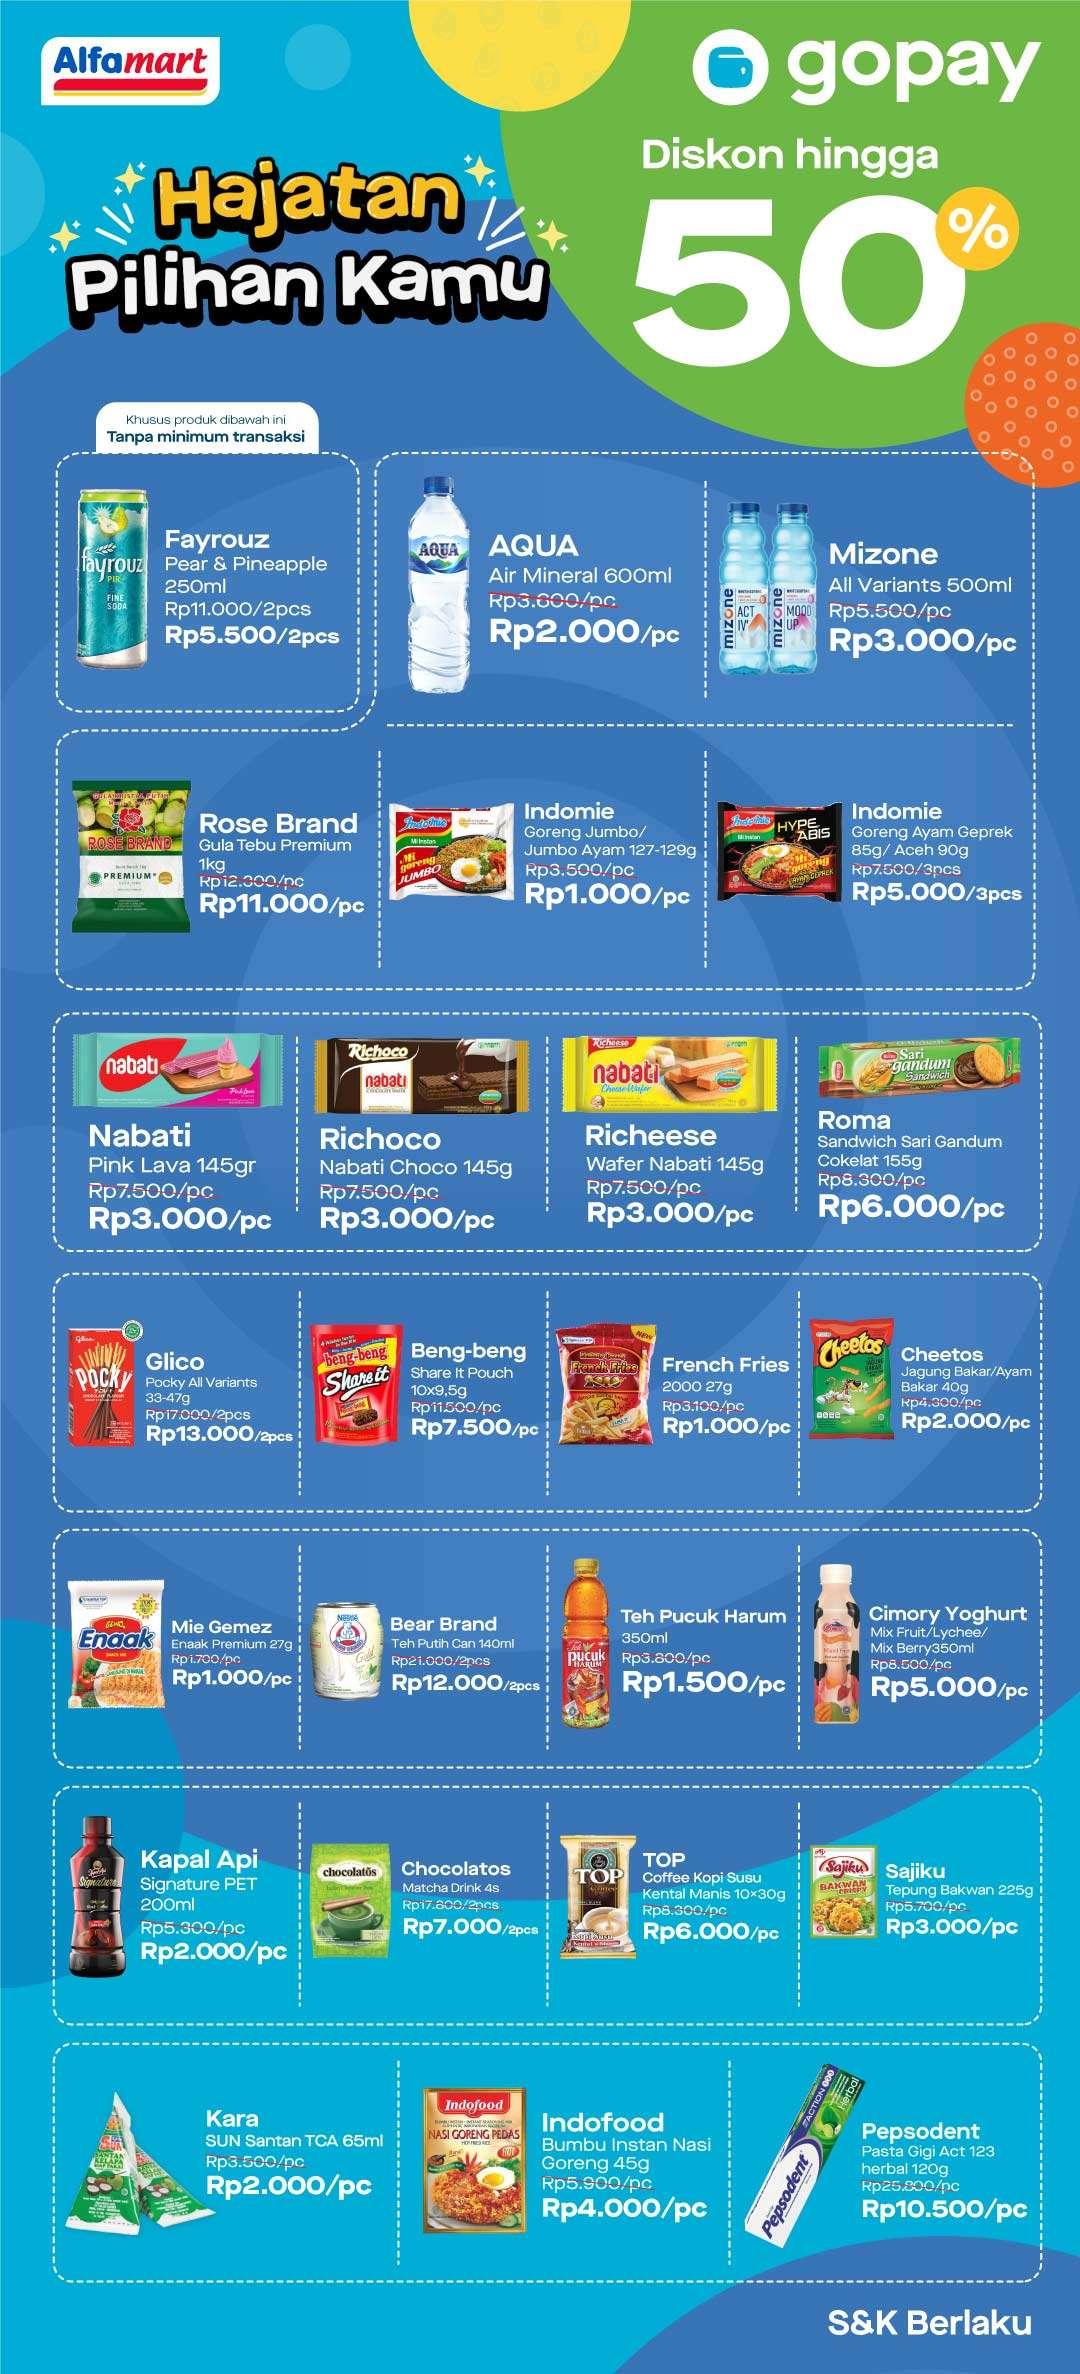 Alfamart Promo Hajatan November Gopay Cashback Hingga 50% dan Voucher Cashback 99%